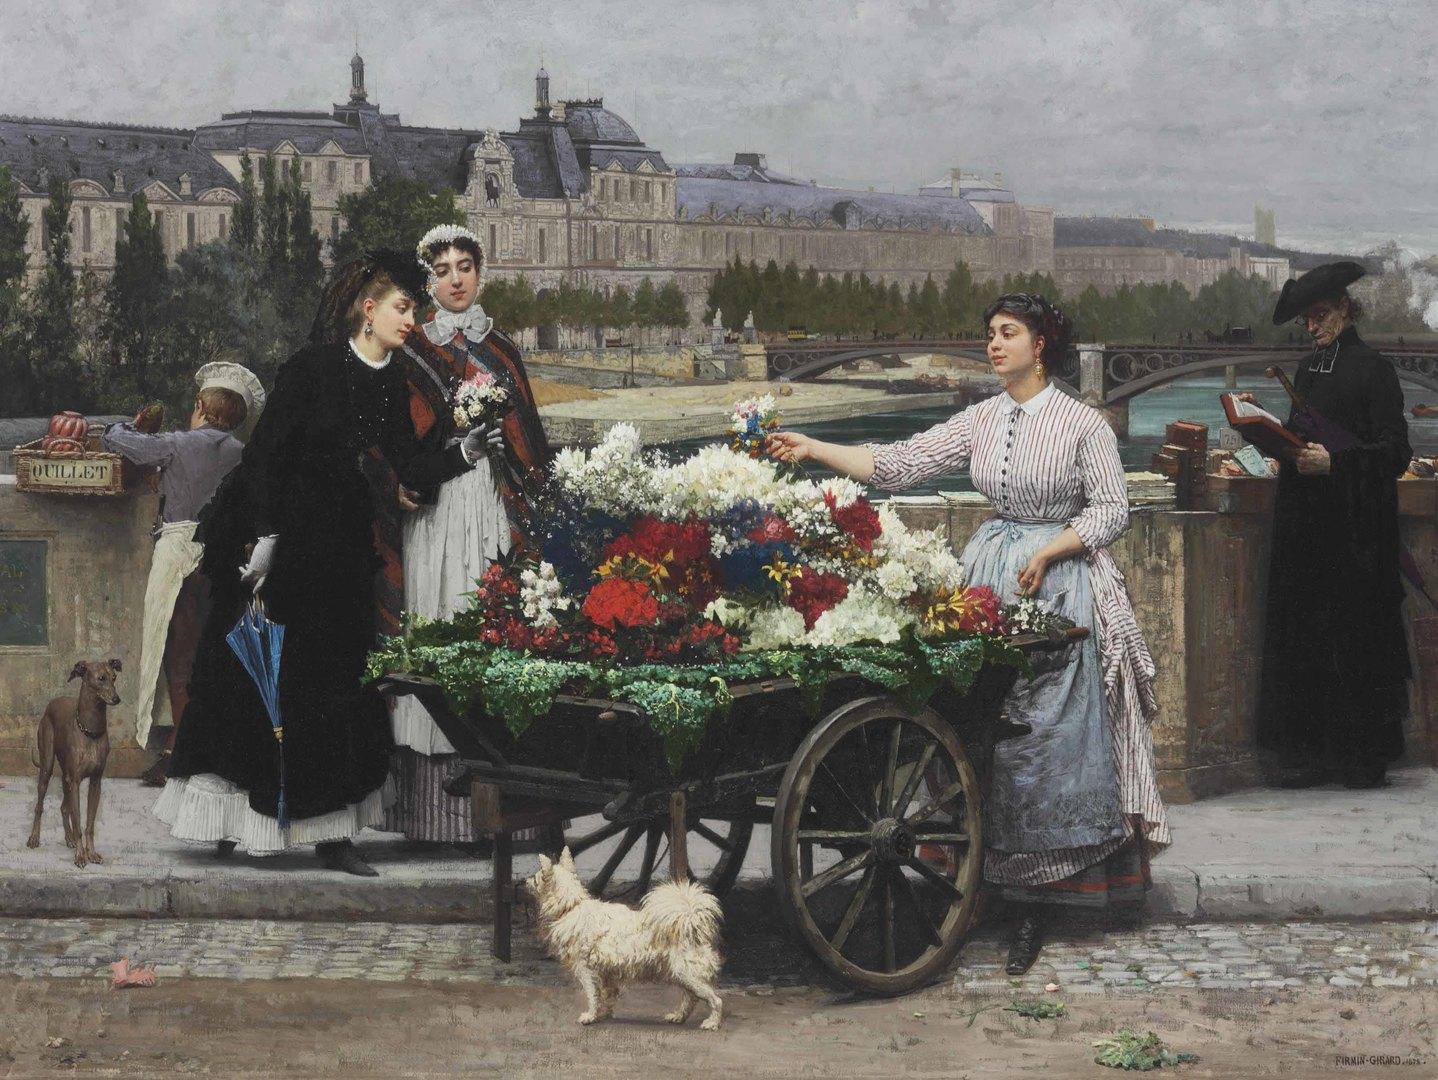 Мари-Франсуа Фермен-Жирара, « Цветочница наКоролевском мосту»